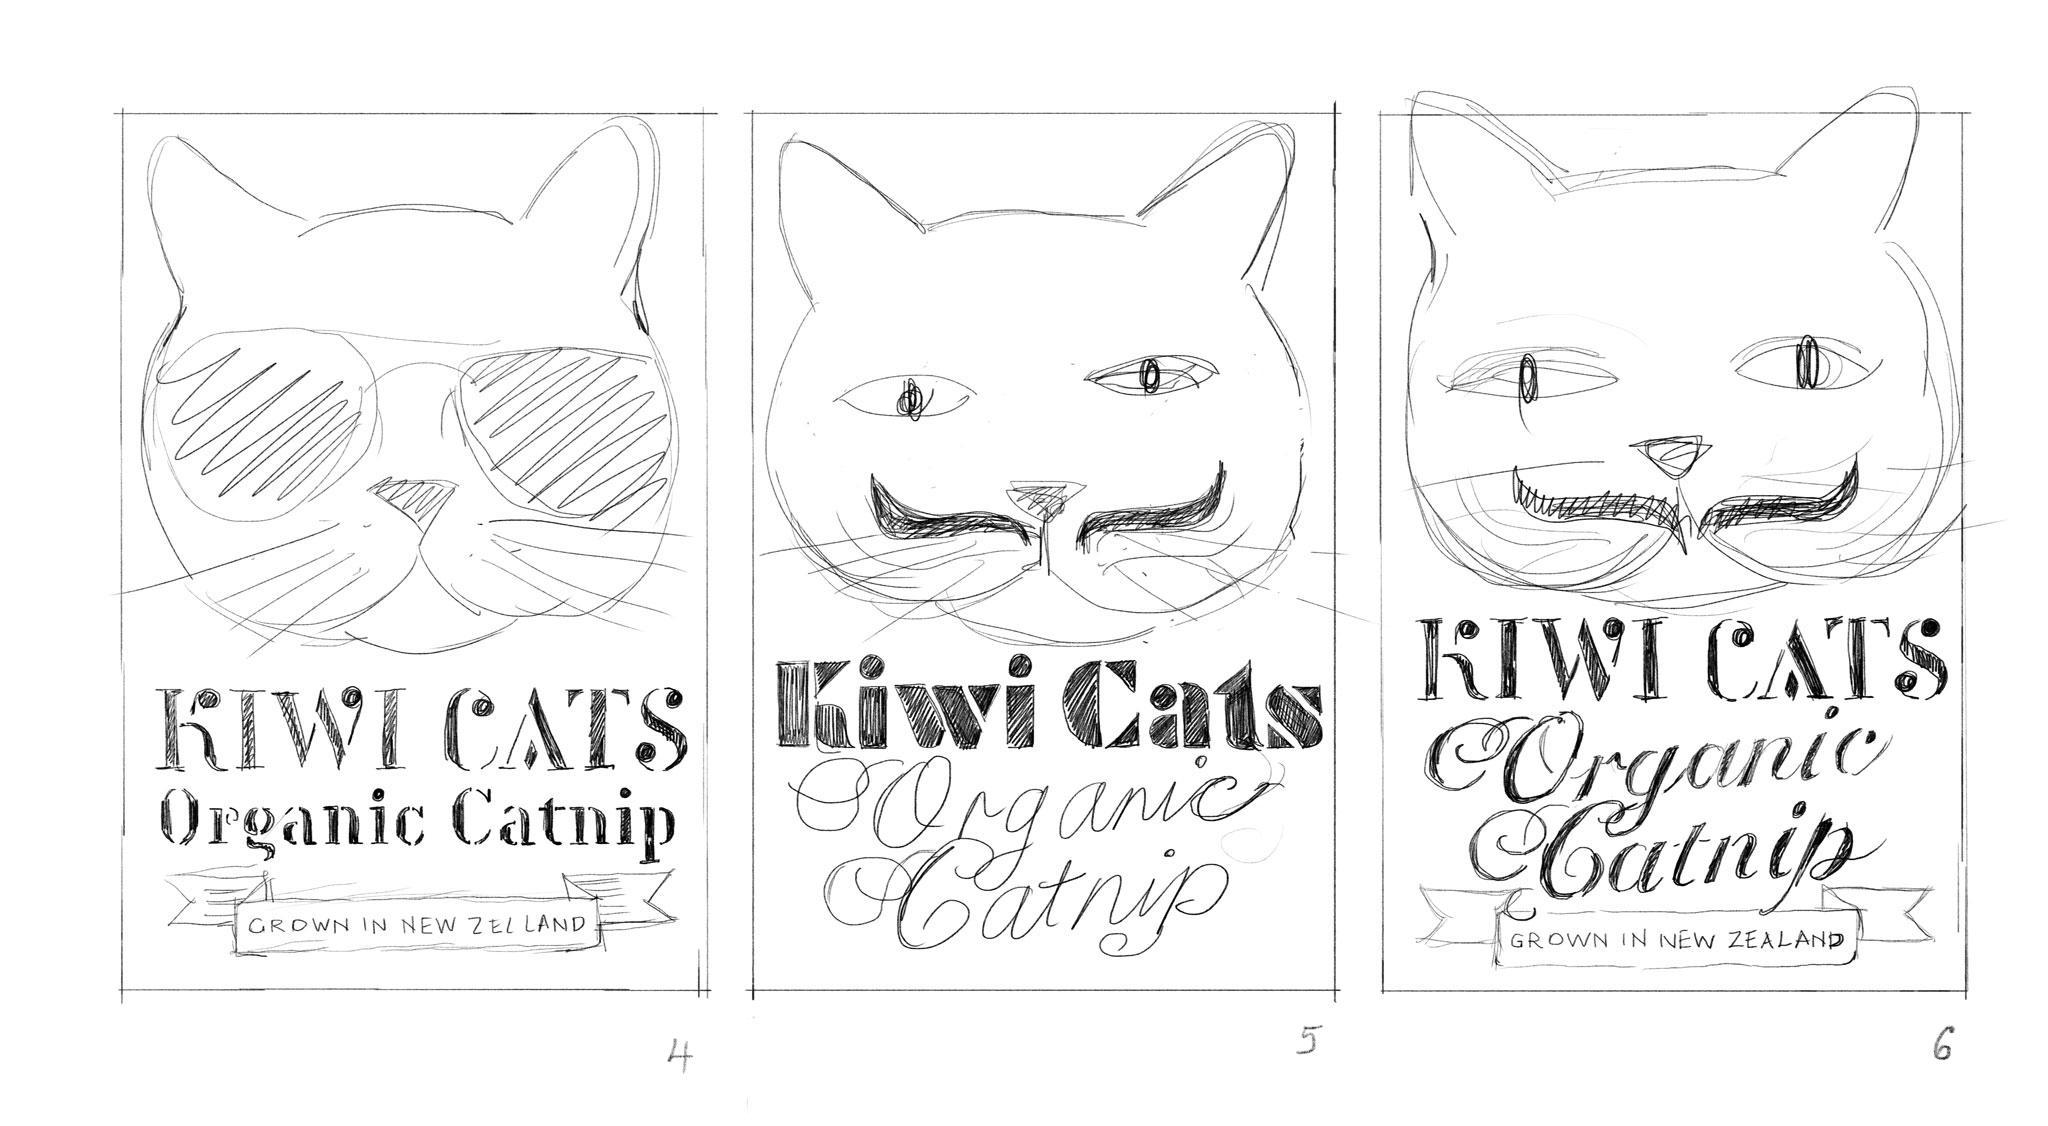 Organic Catnip Label - image 6 - student project